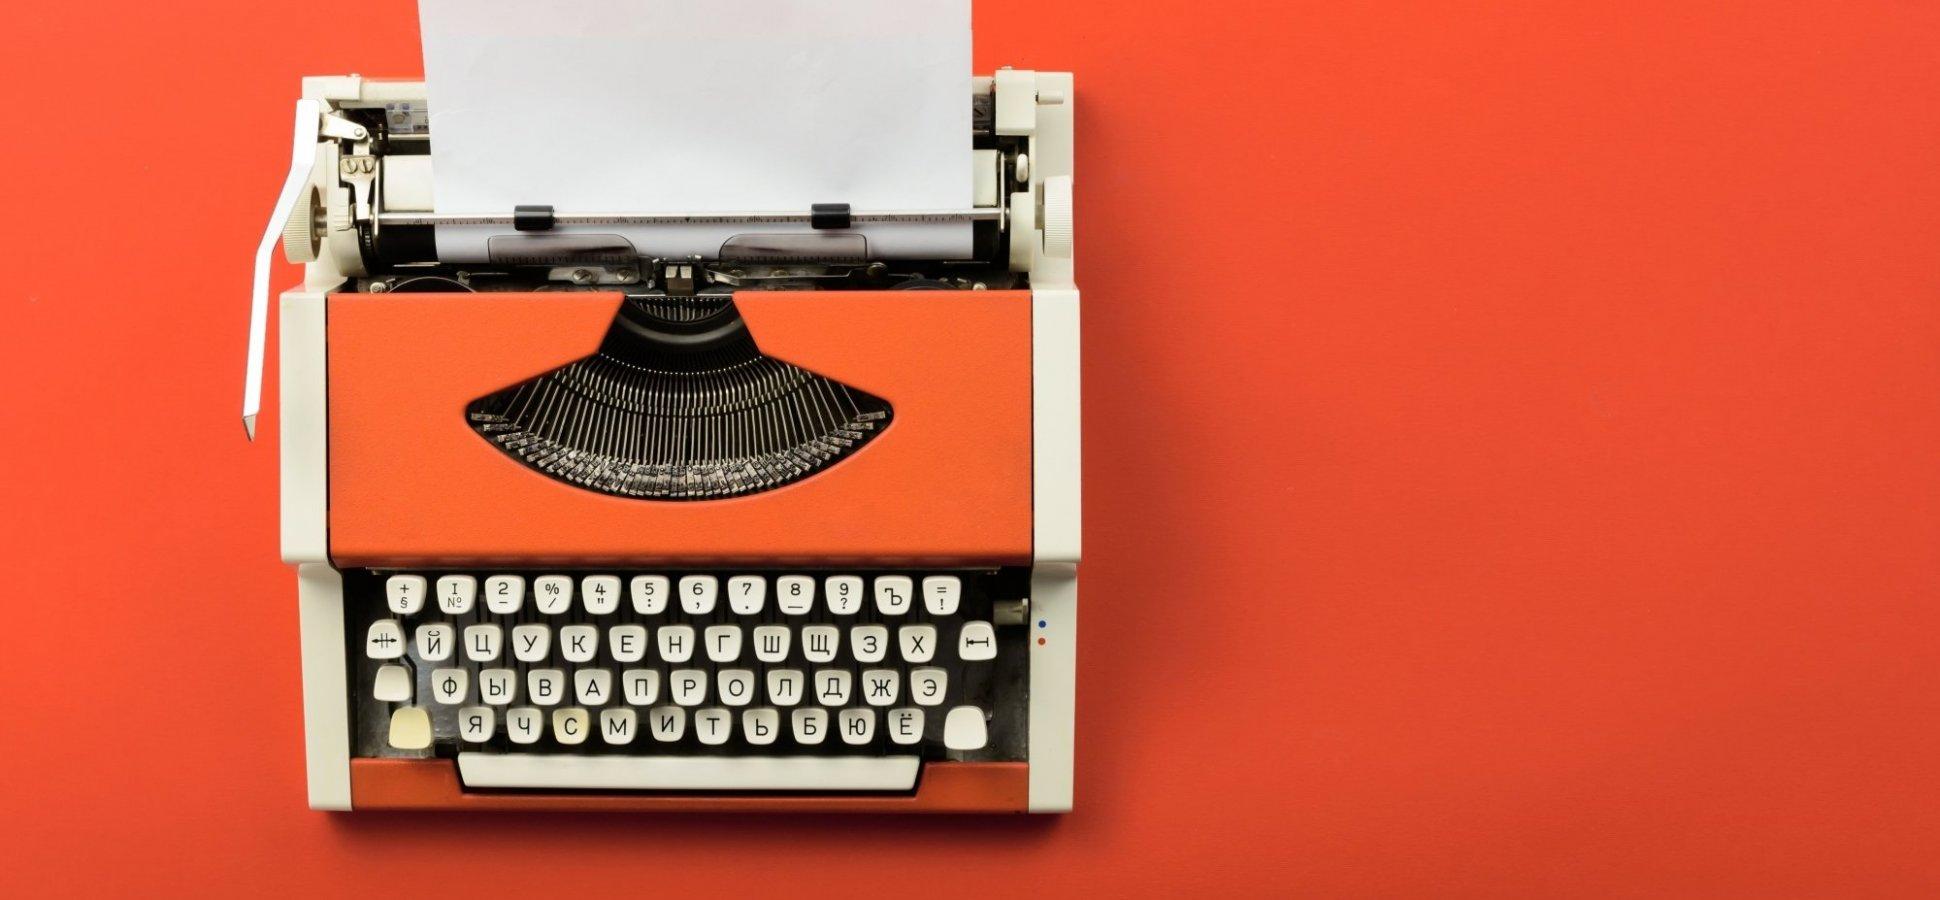 How to Write a Compelling Company Description